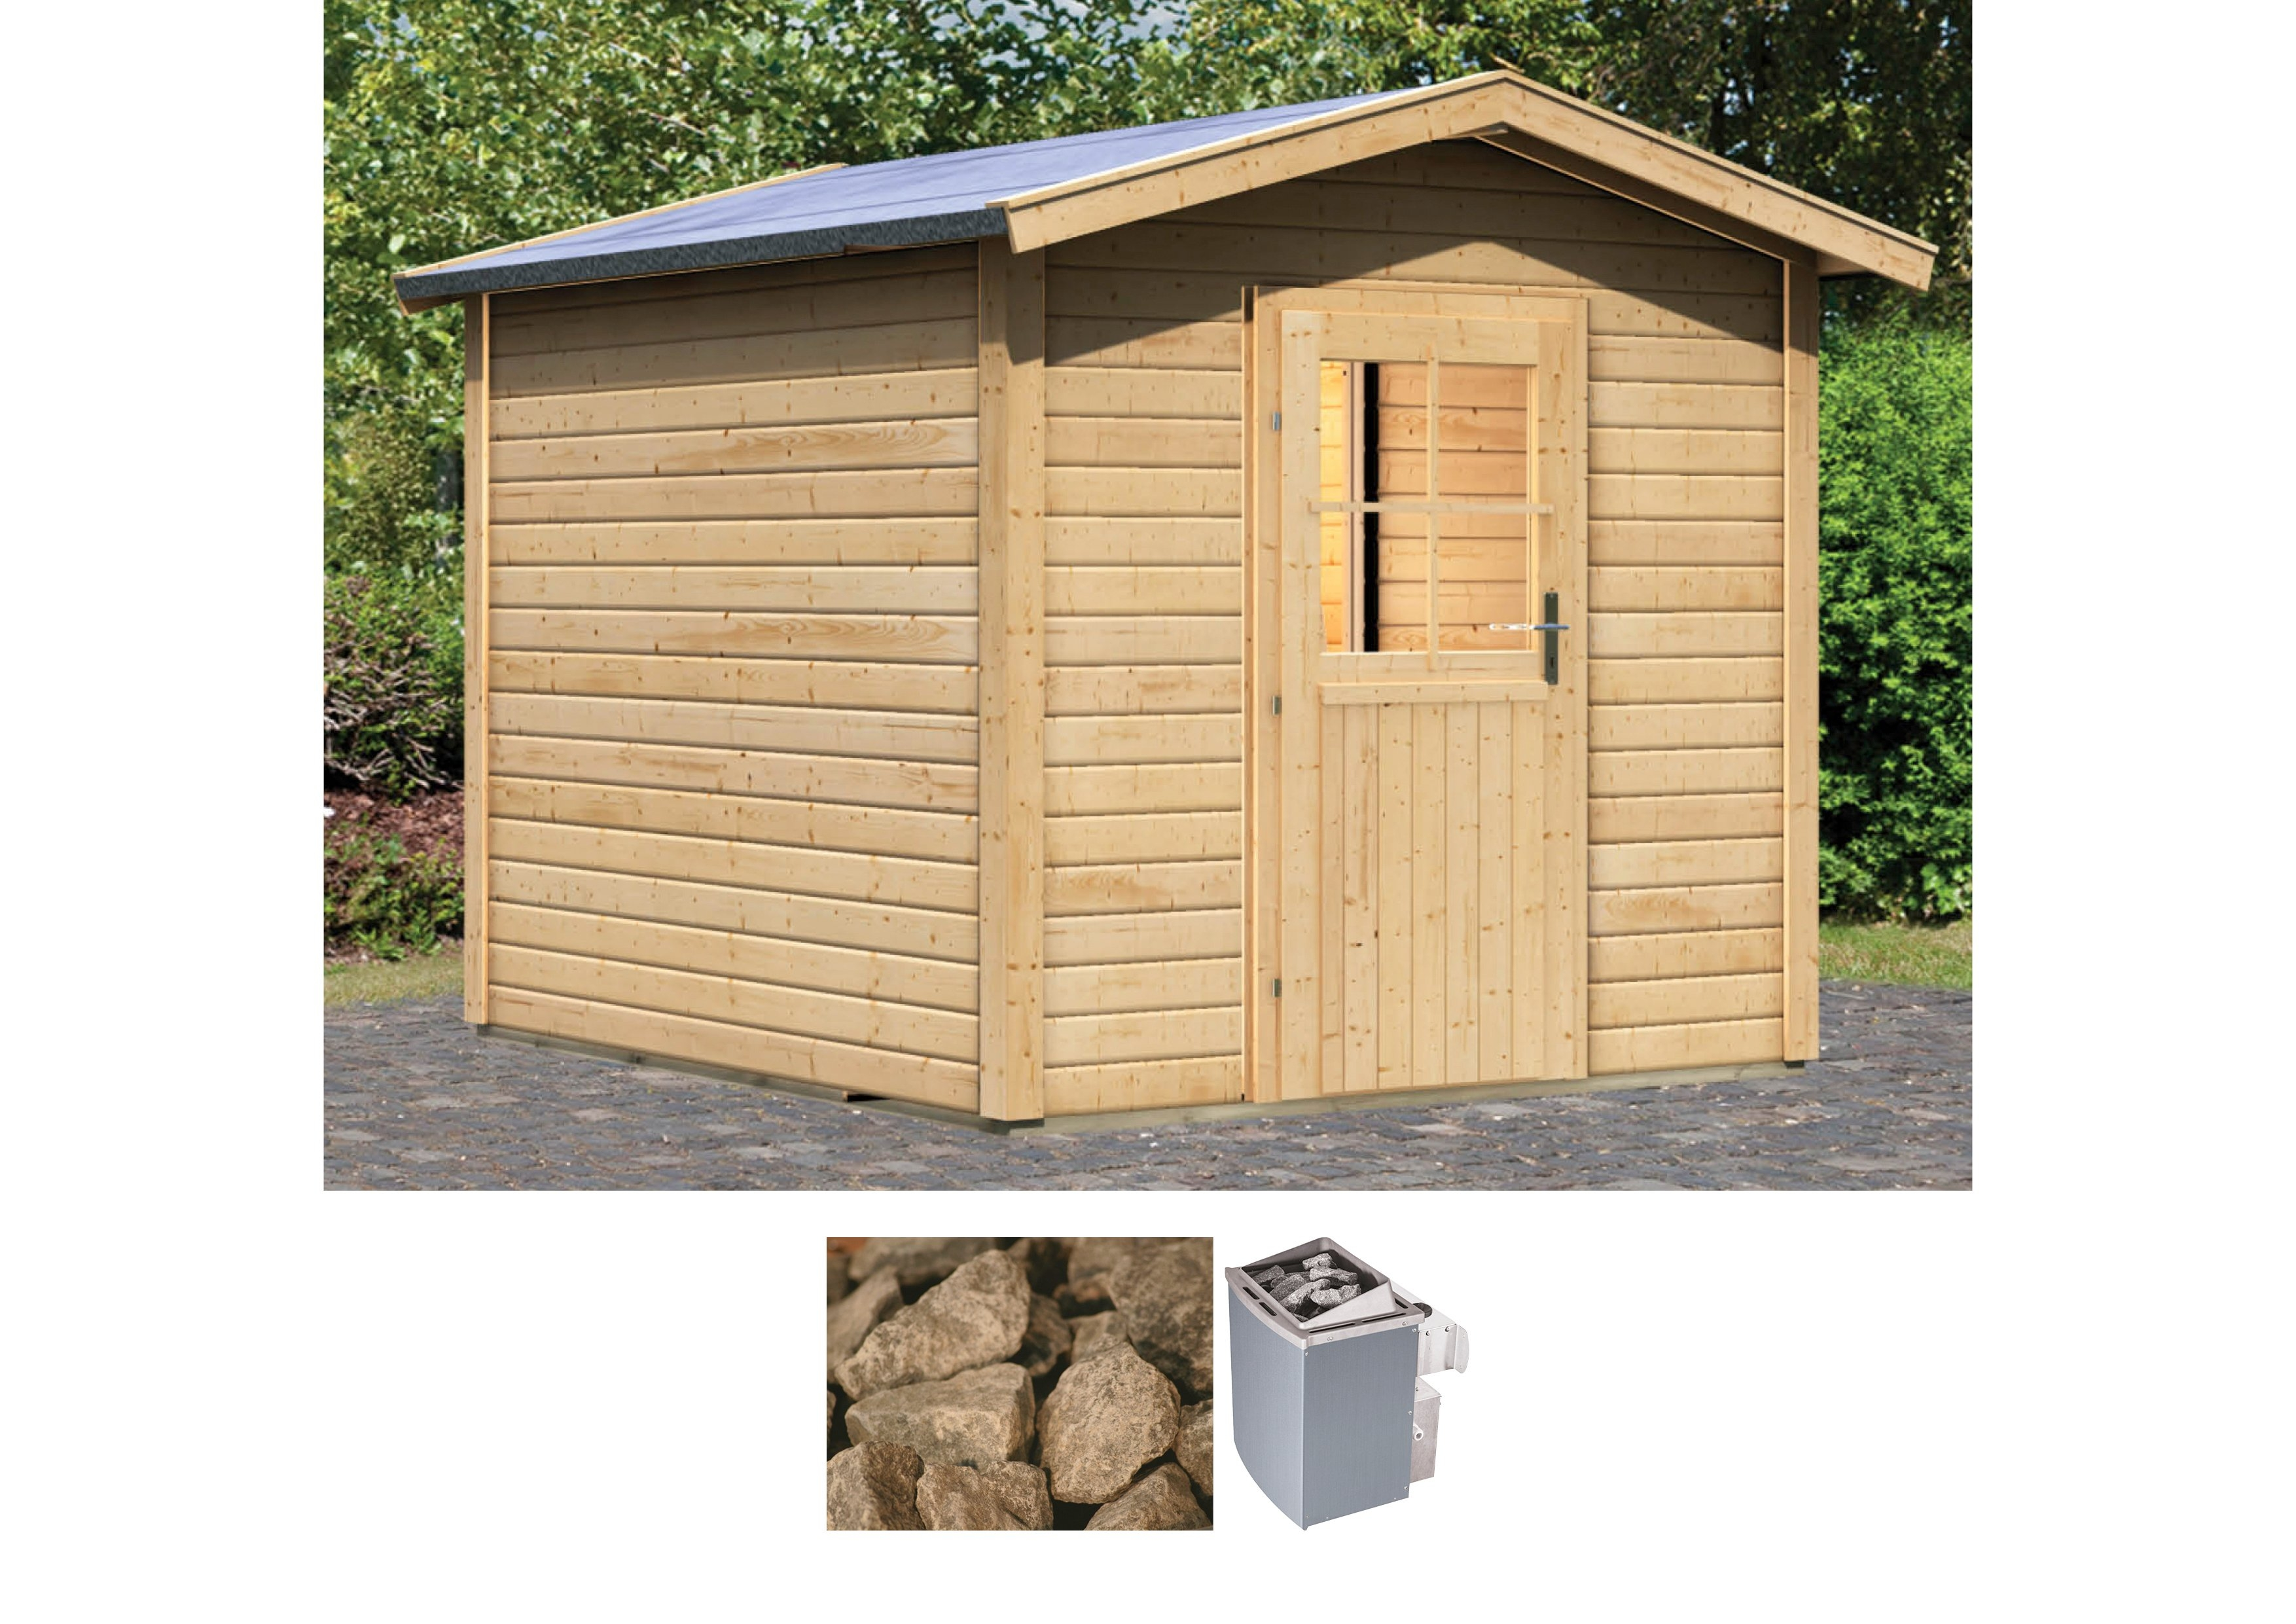 Kachel Voor Garage : Karibu saunahut 231x273x235 cm 9 kw kachel met interne bediening